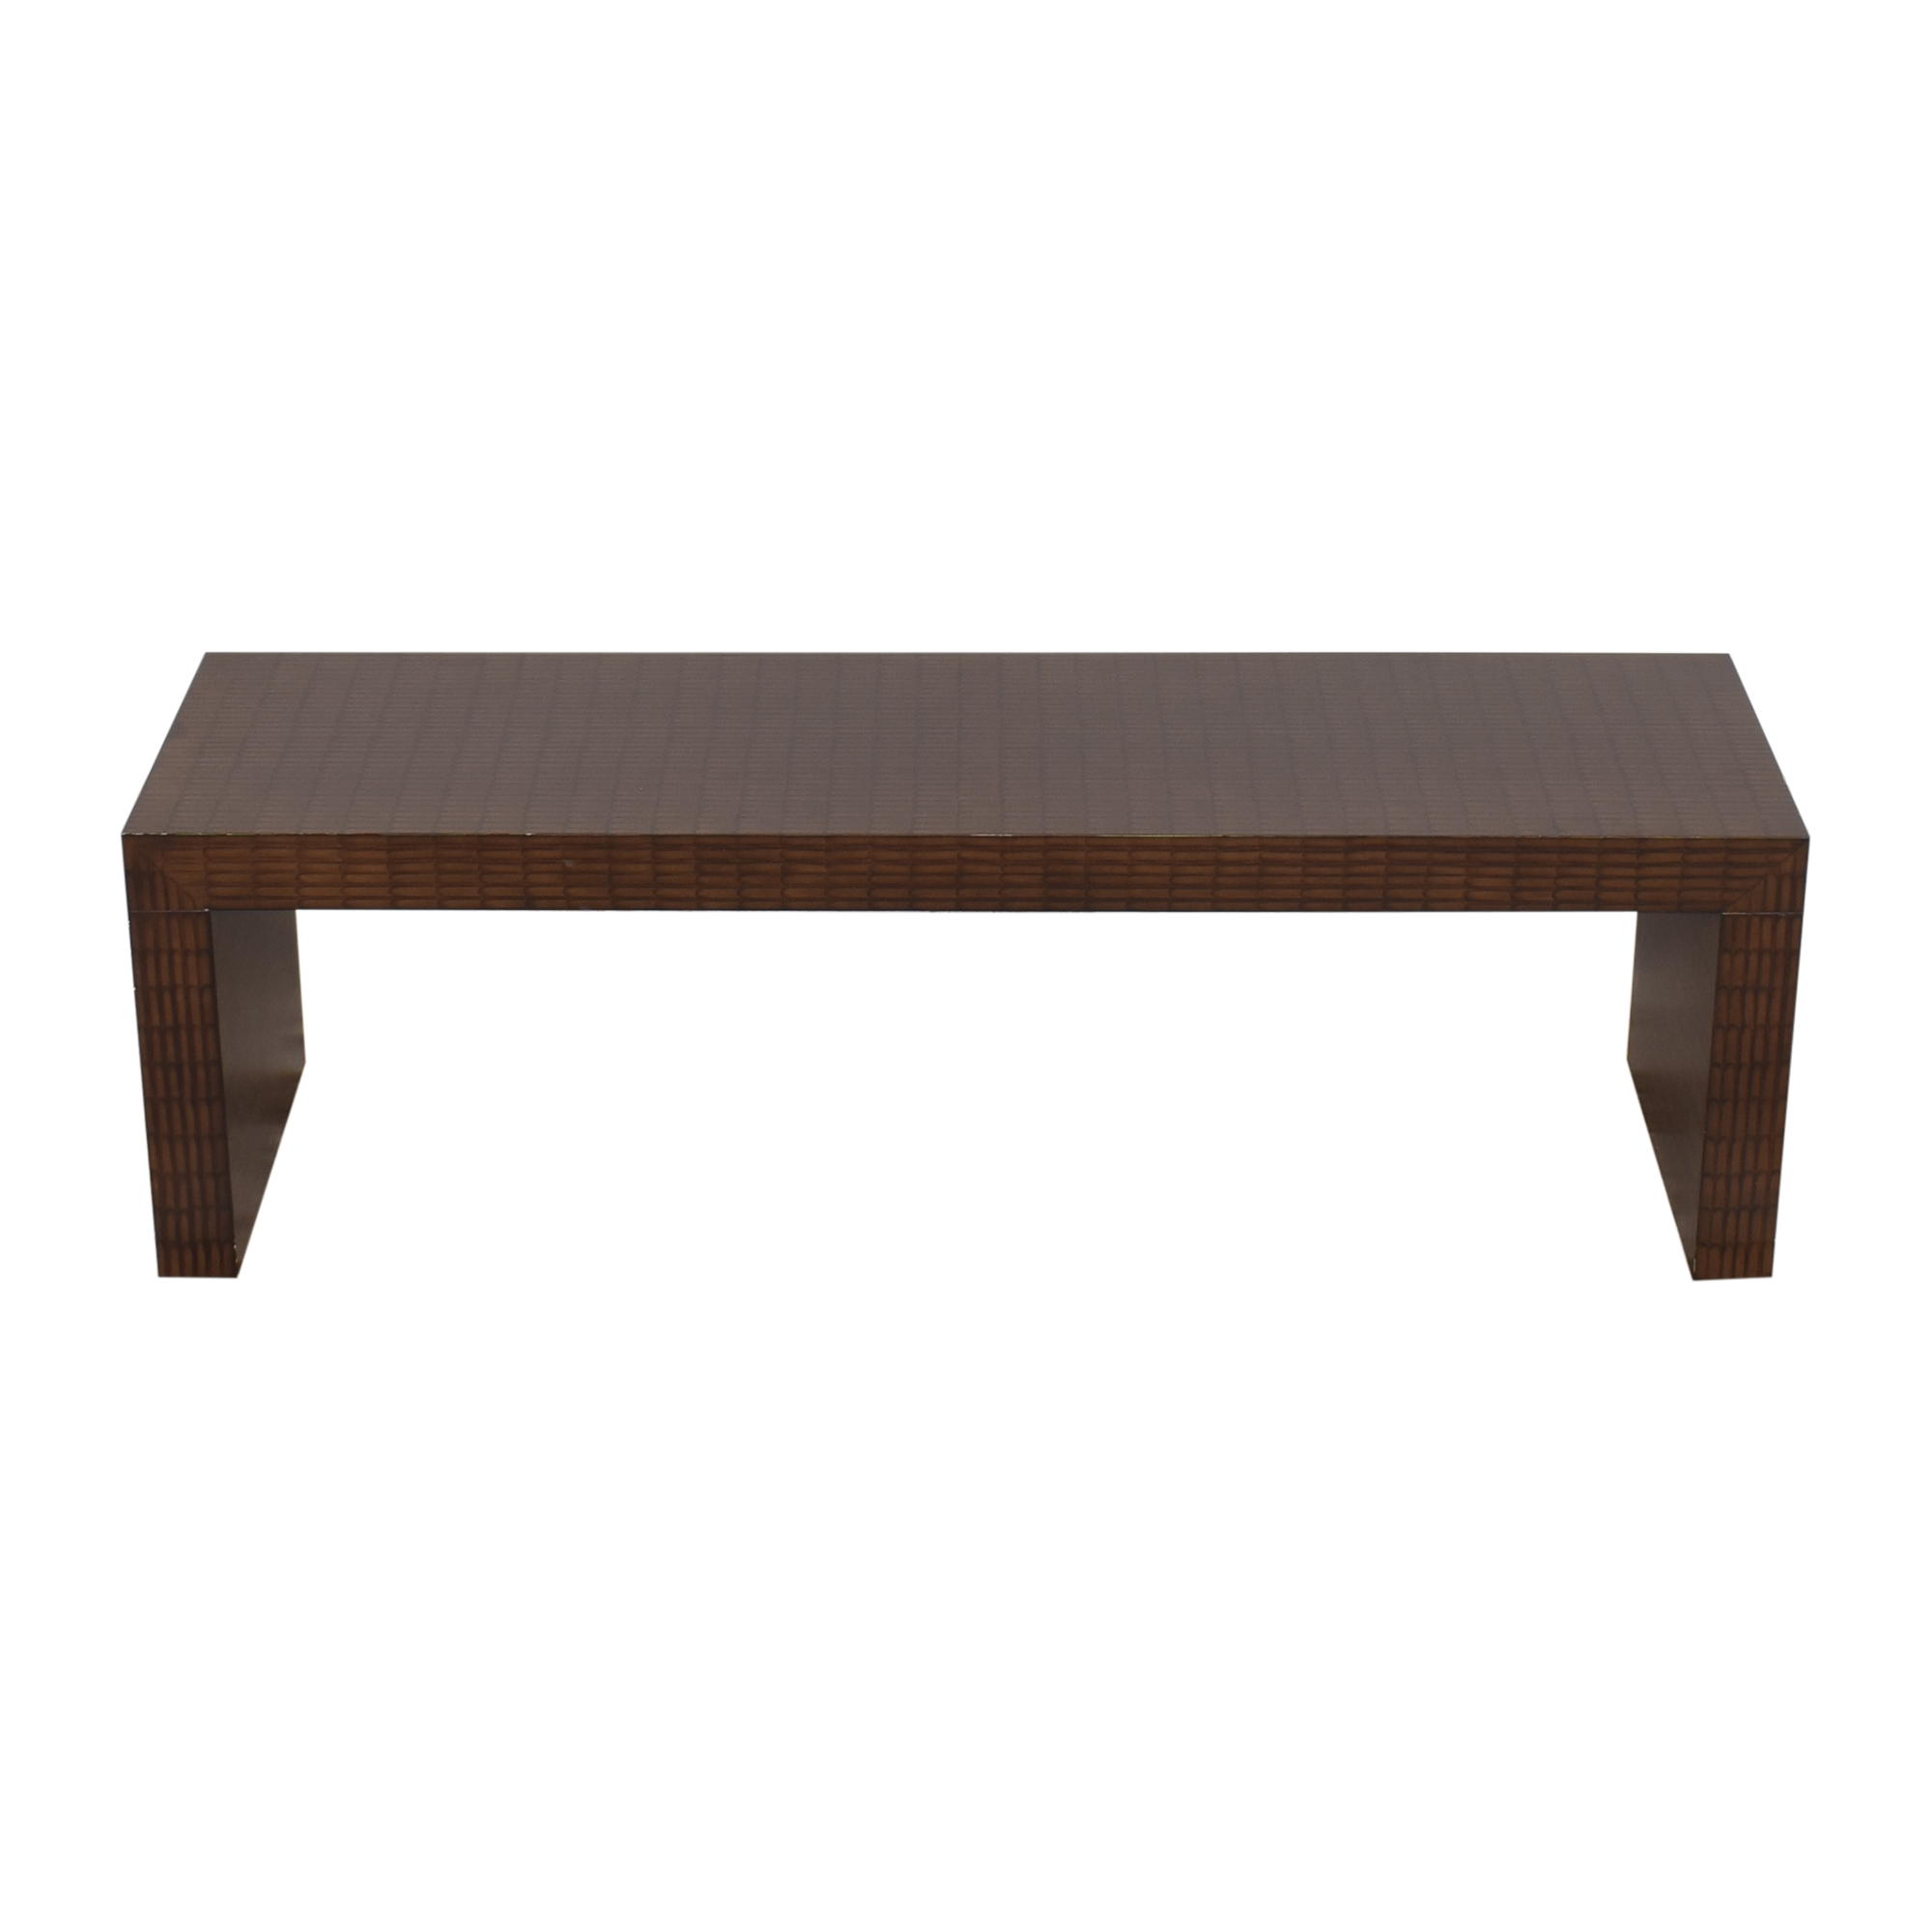 Baker Furniture Baker Furniture Coffee Table pa